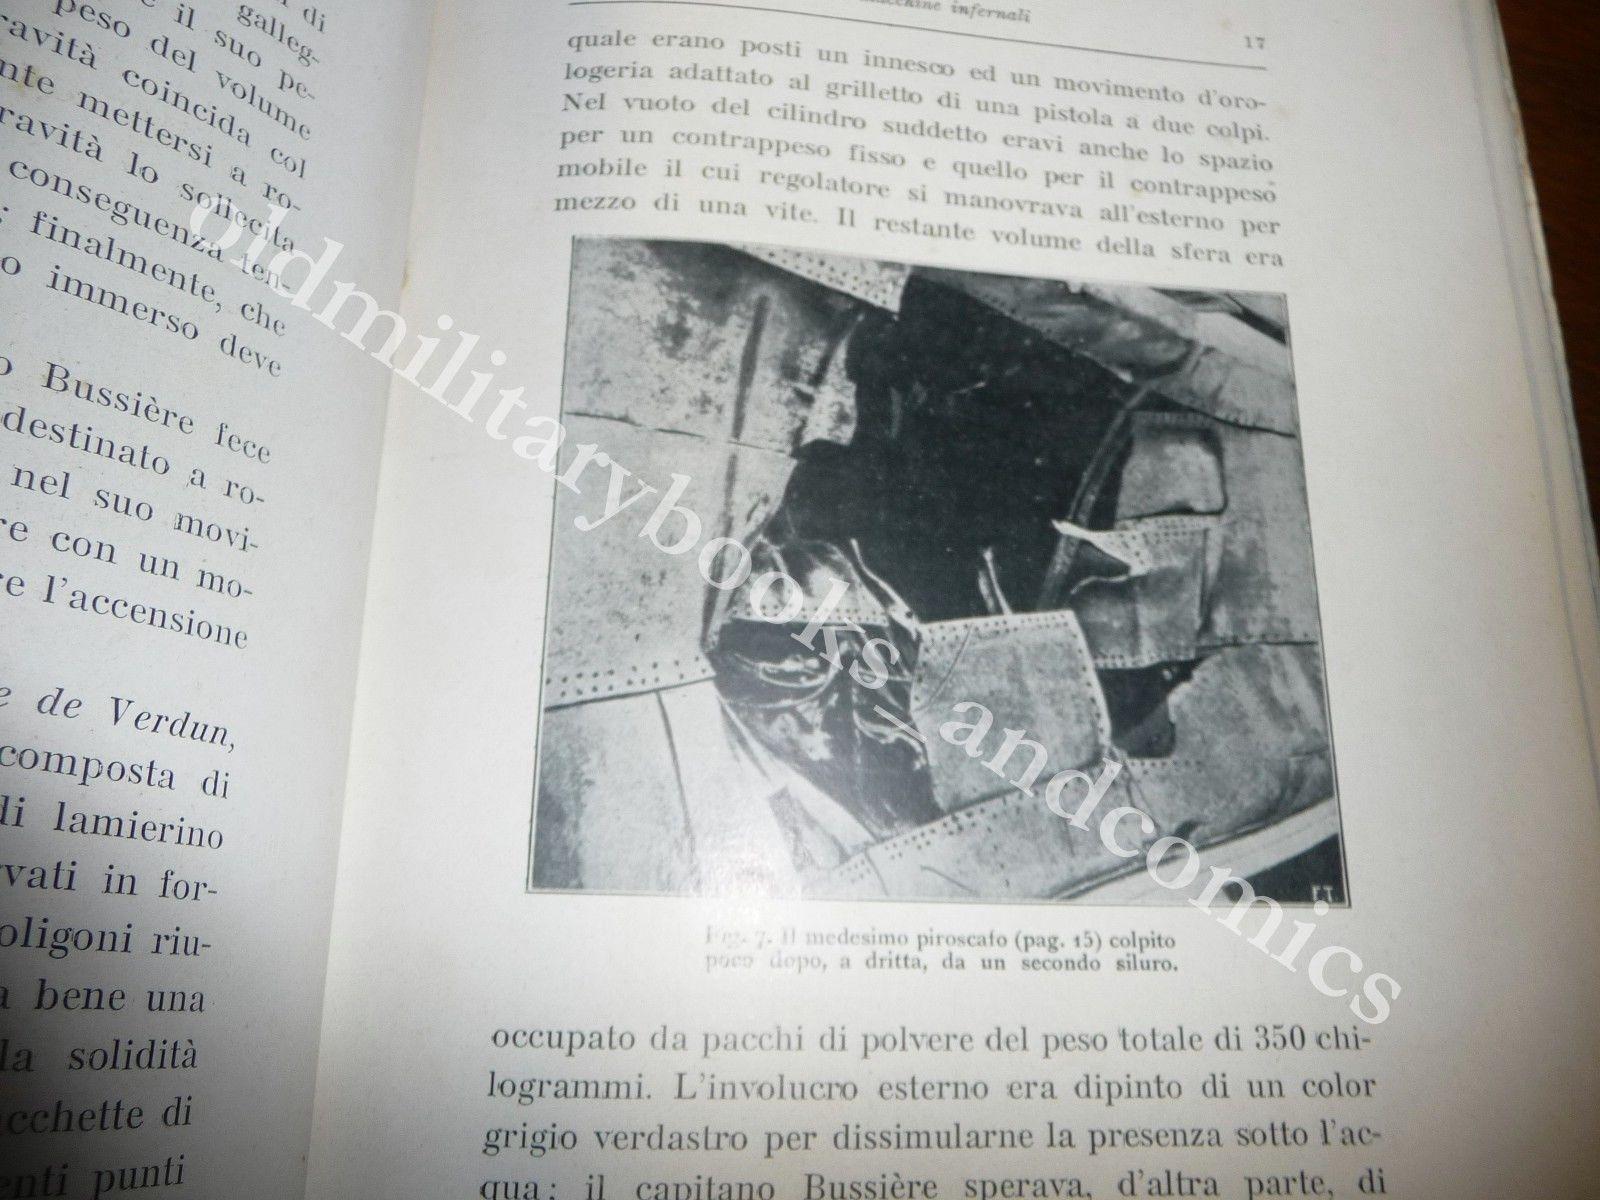 MACCHINE INFERNALI SILURI E LANCIASILURI ESPLOSIVI DA GUERRA ETTORE BRAVETTA